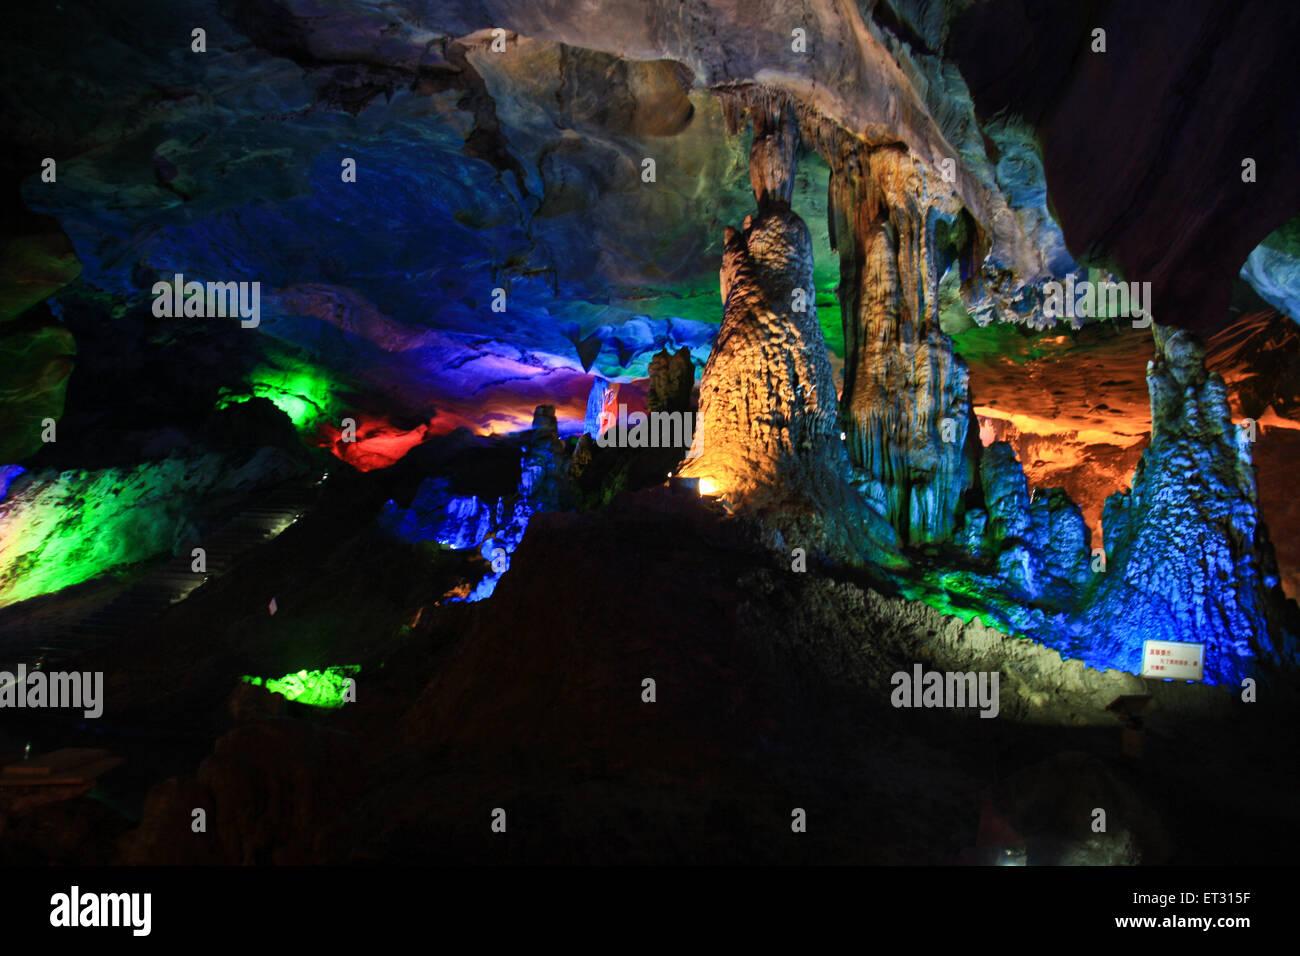 strange shapes in the karst cave. Stock Photo